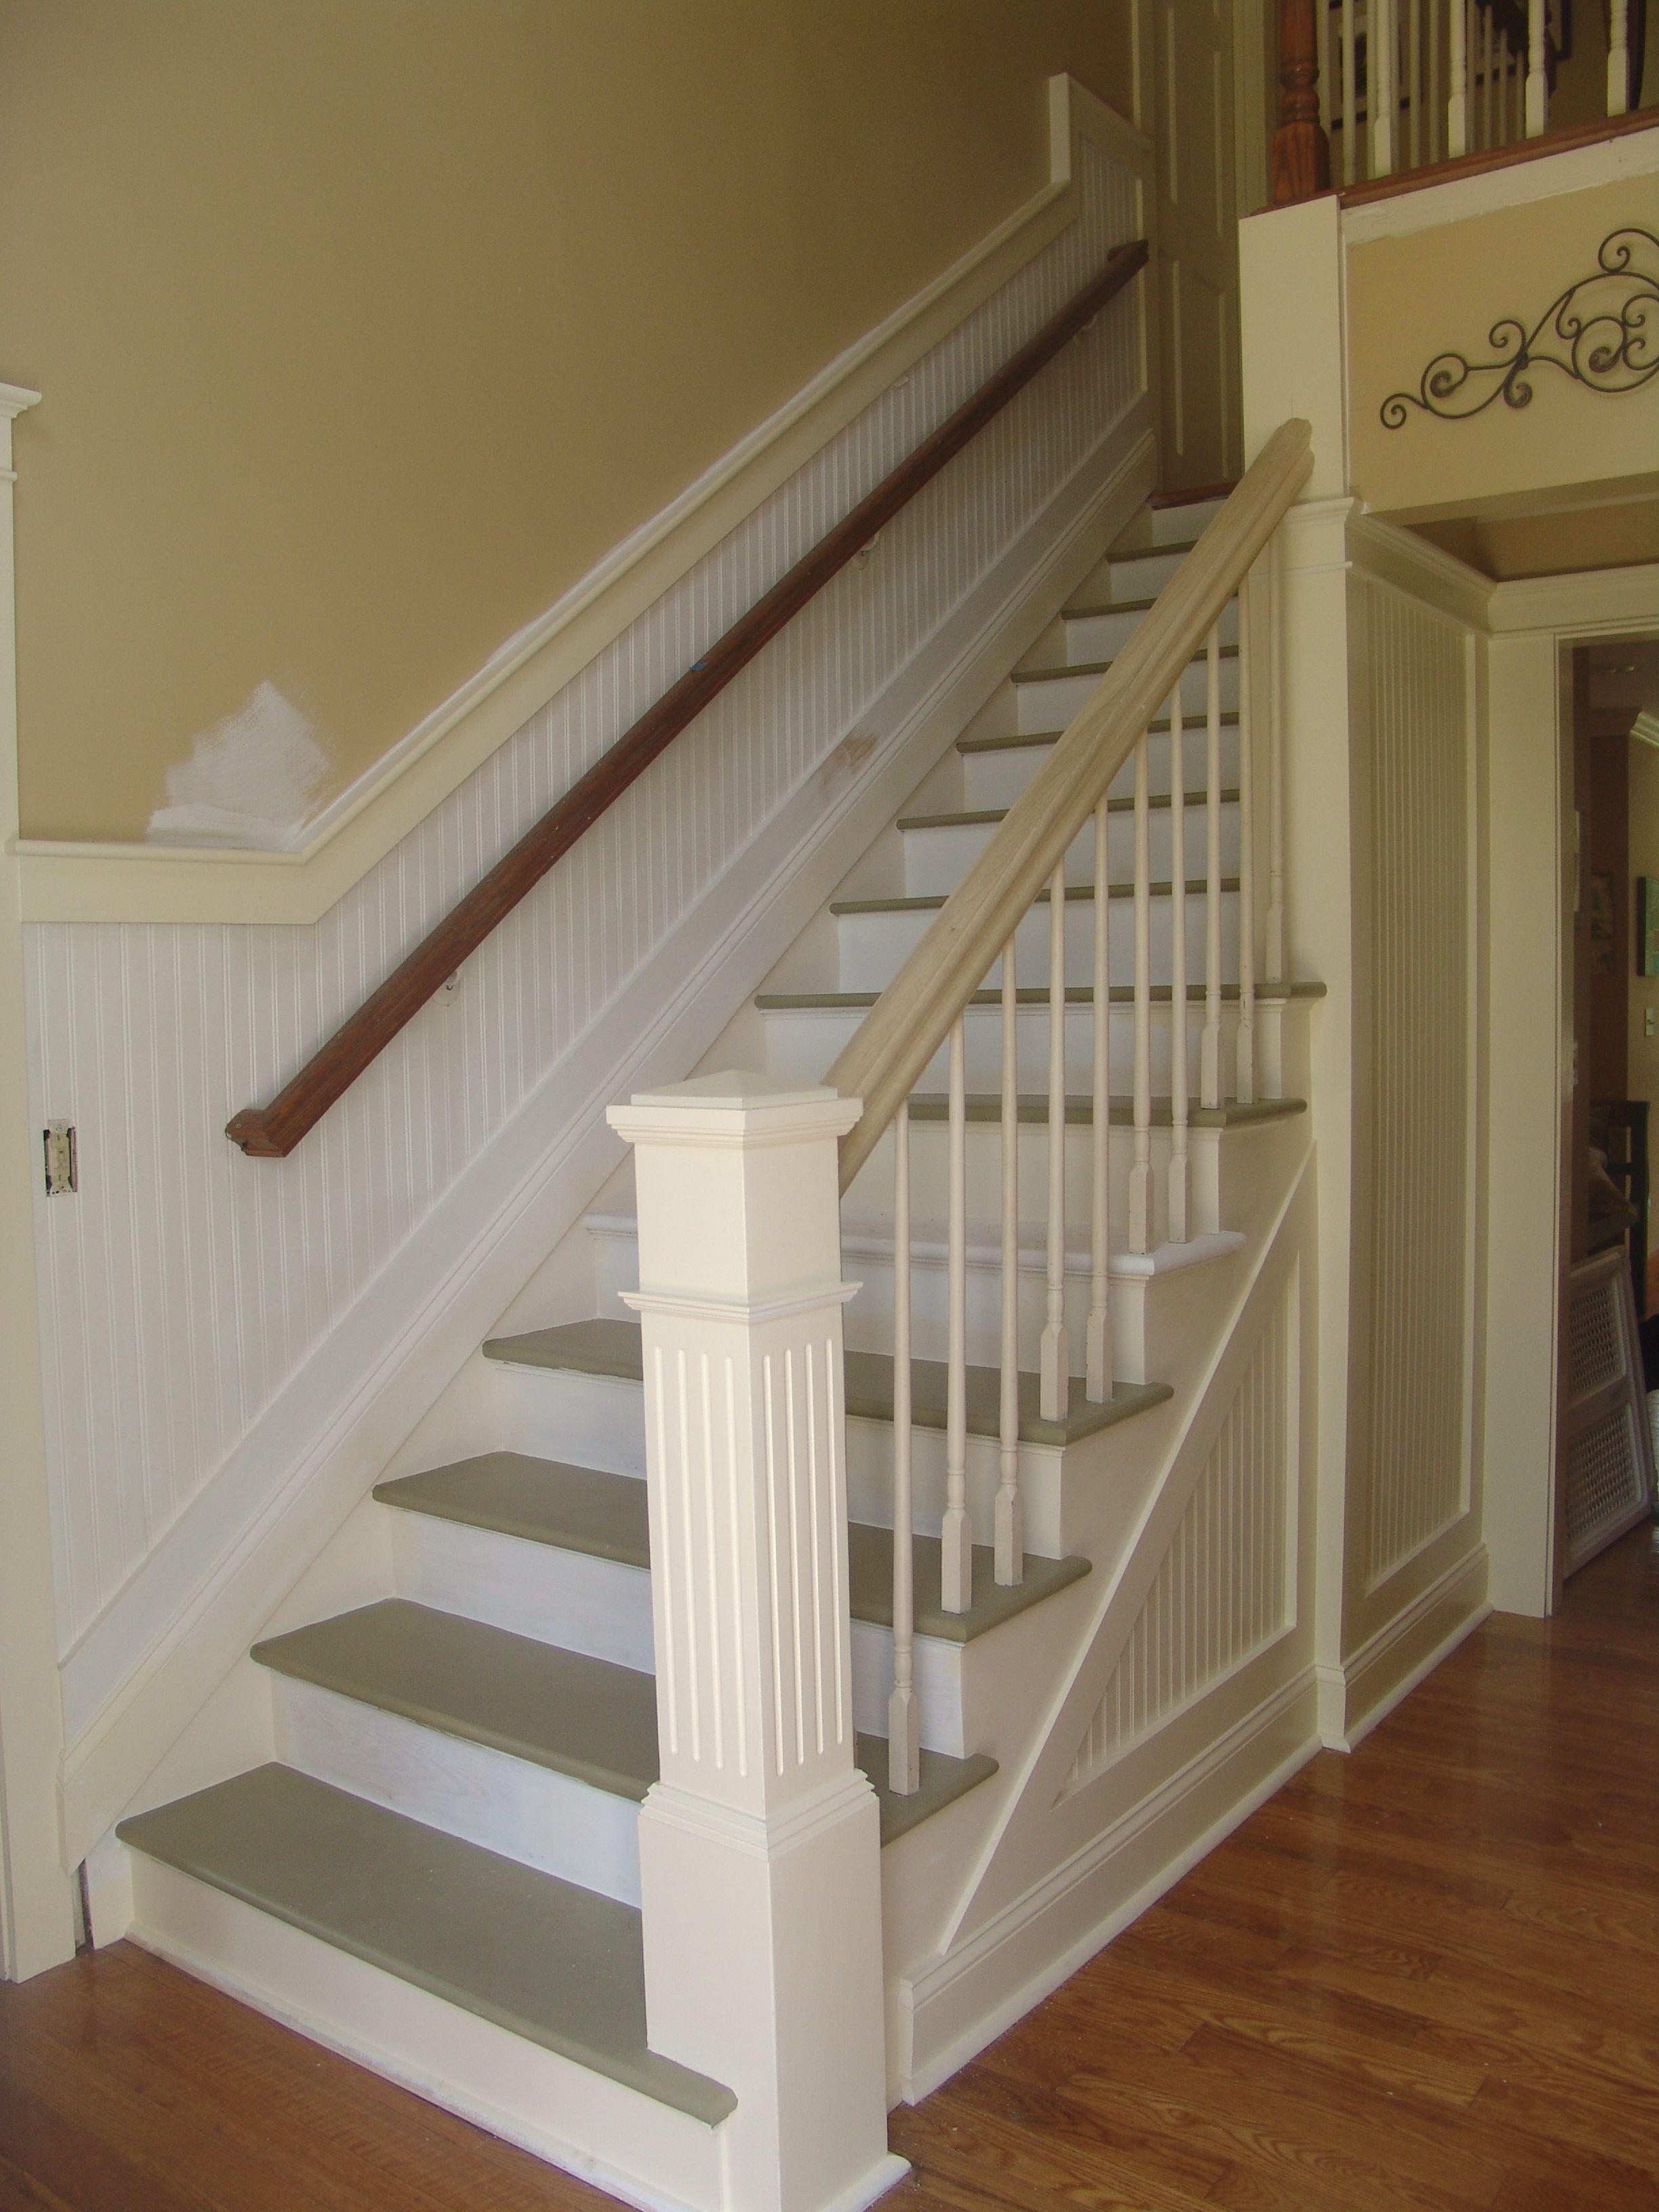 Custom Newel Post Stairway Upgrade From Carpet To The Beginnings Of Thiscustom